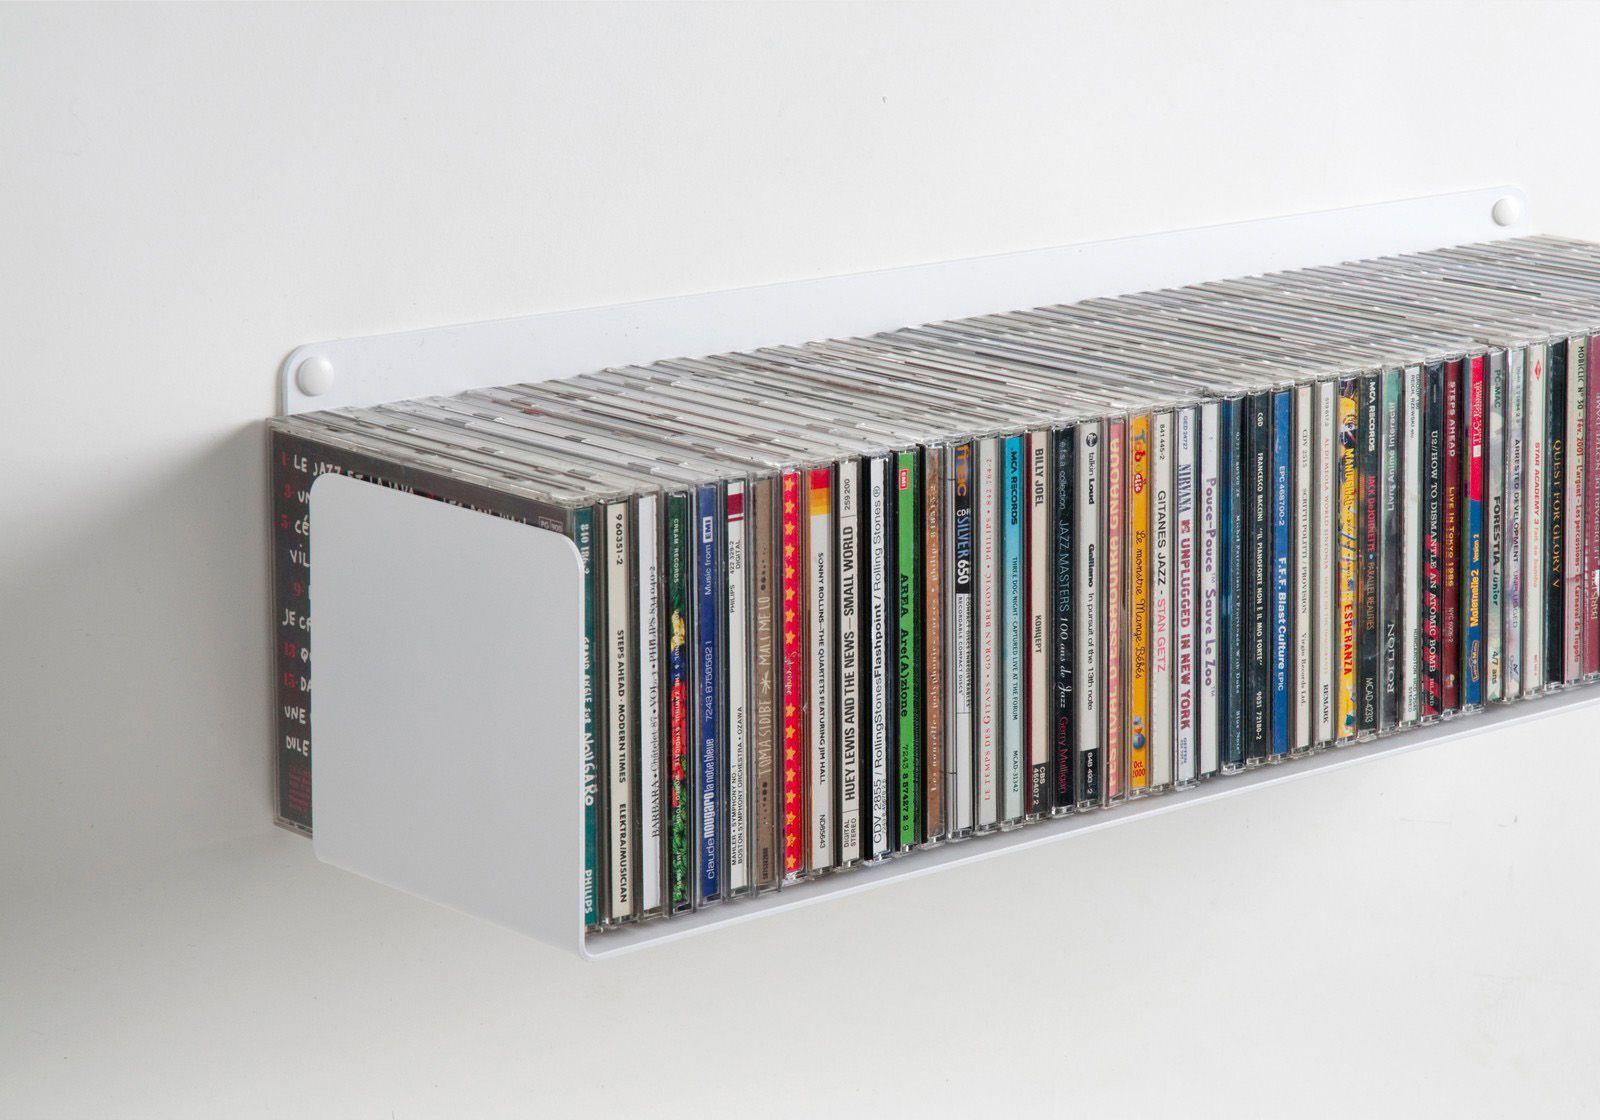 Tagre Cd Dvd Ikea Benno Dvd Cd Tower With Range Dvd Ikea Eric  # Idee Rangement Cd